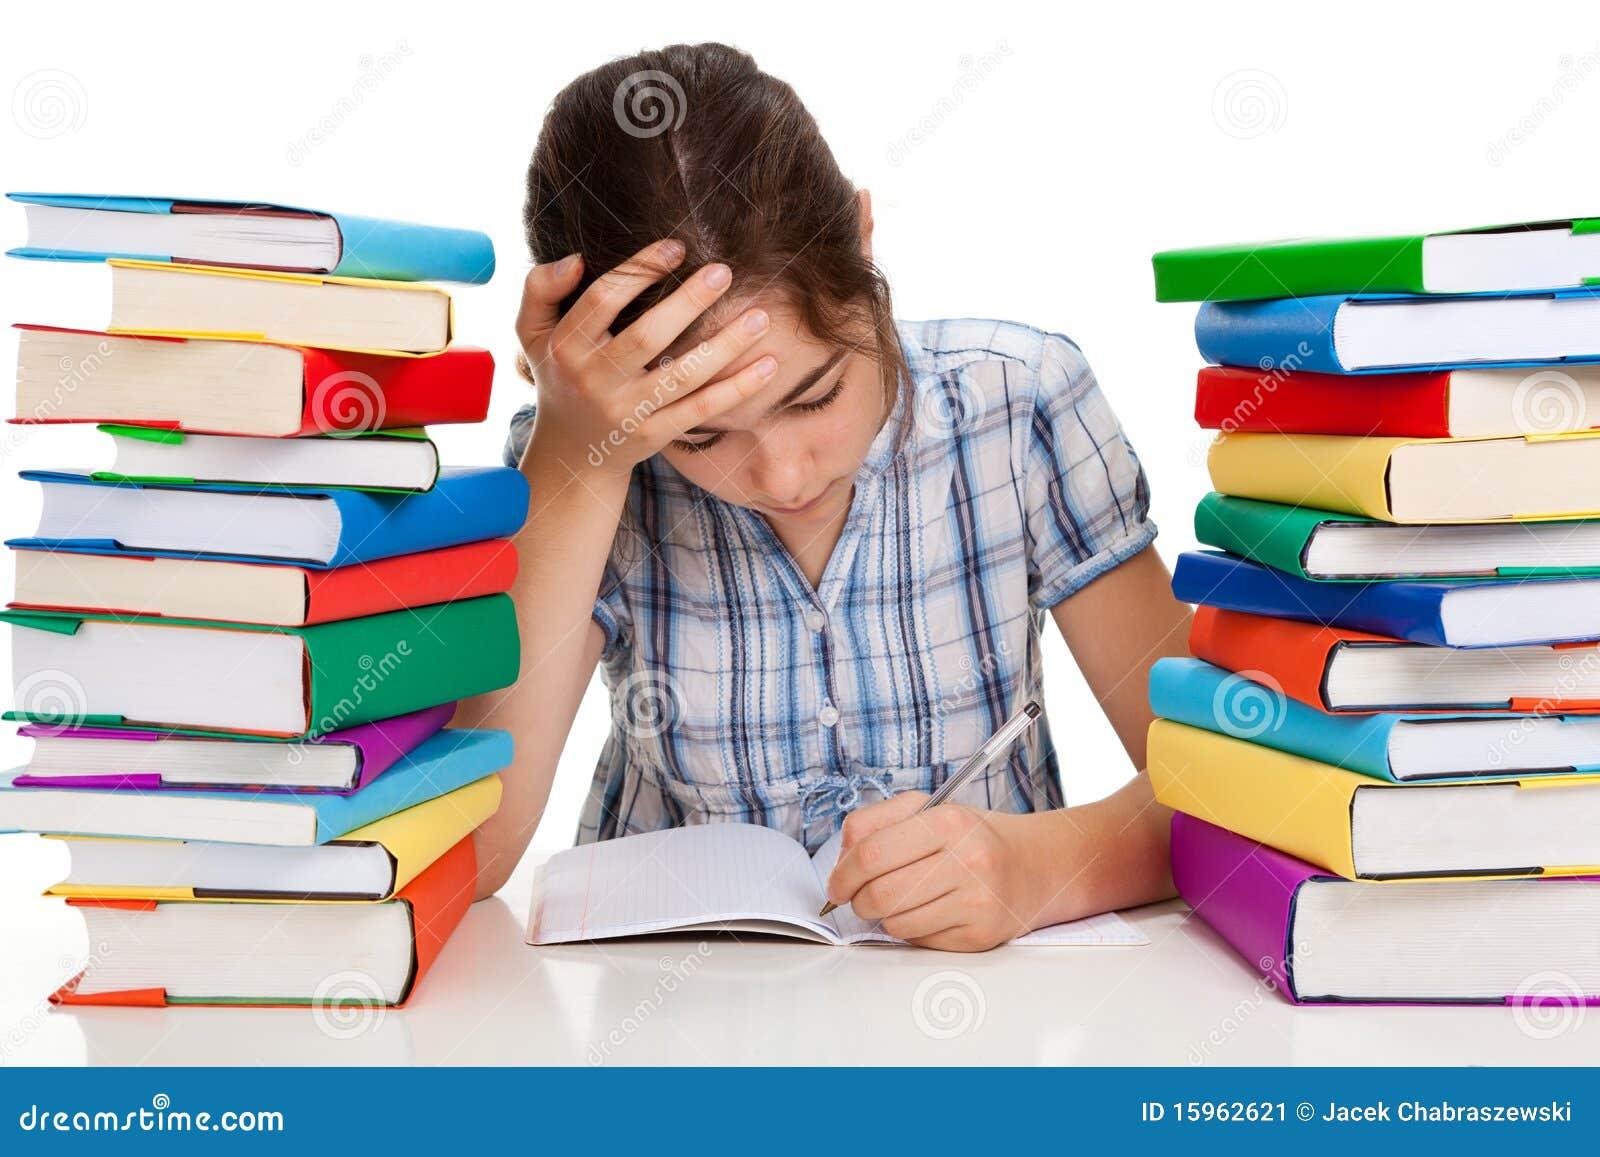 Should teacher give homework essay